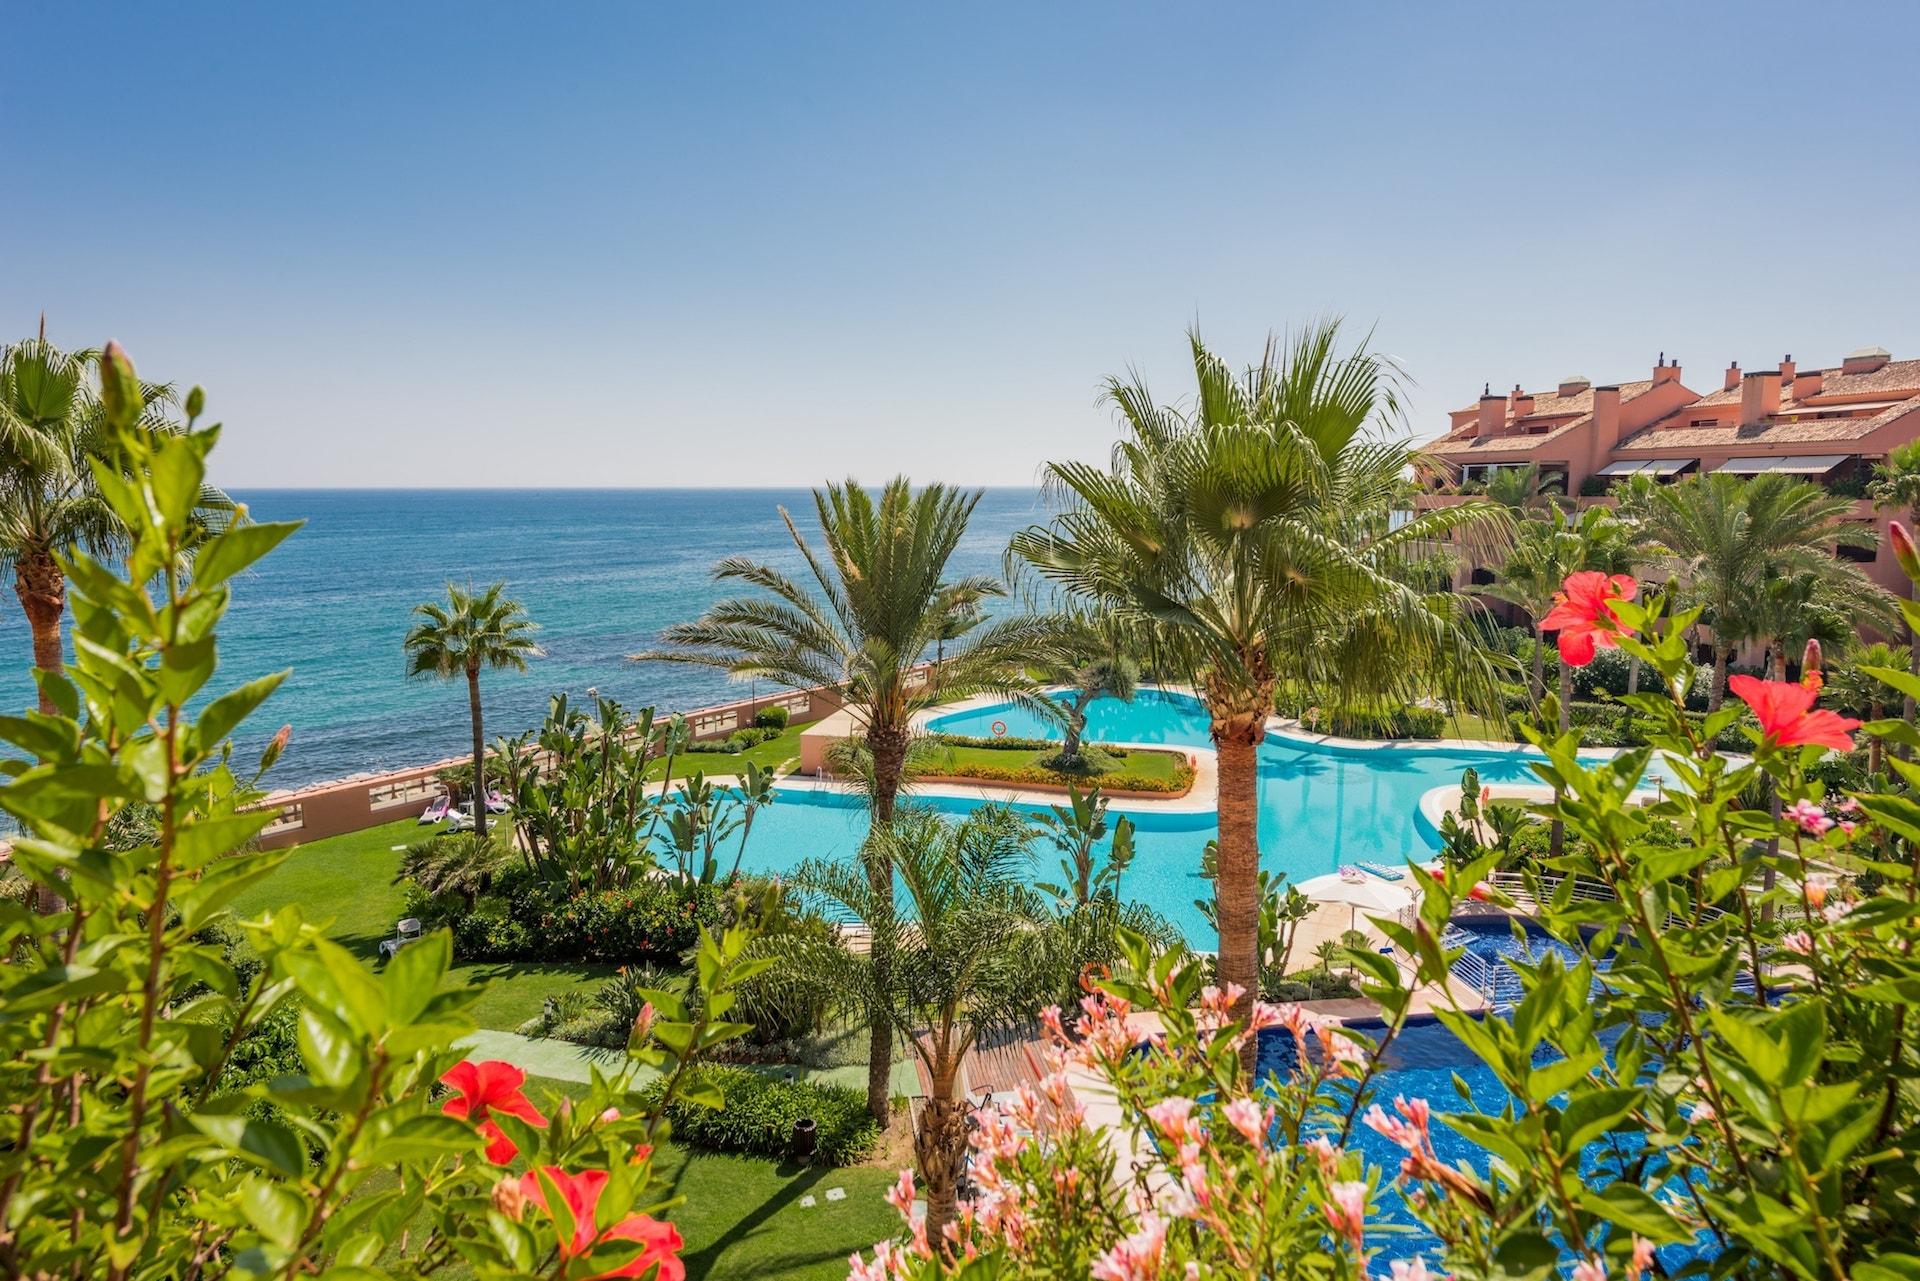 Malibu, Beachfront Stunning Penthouse in Luxury Development